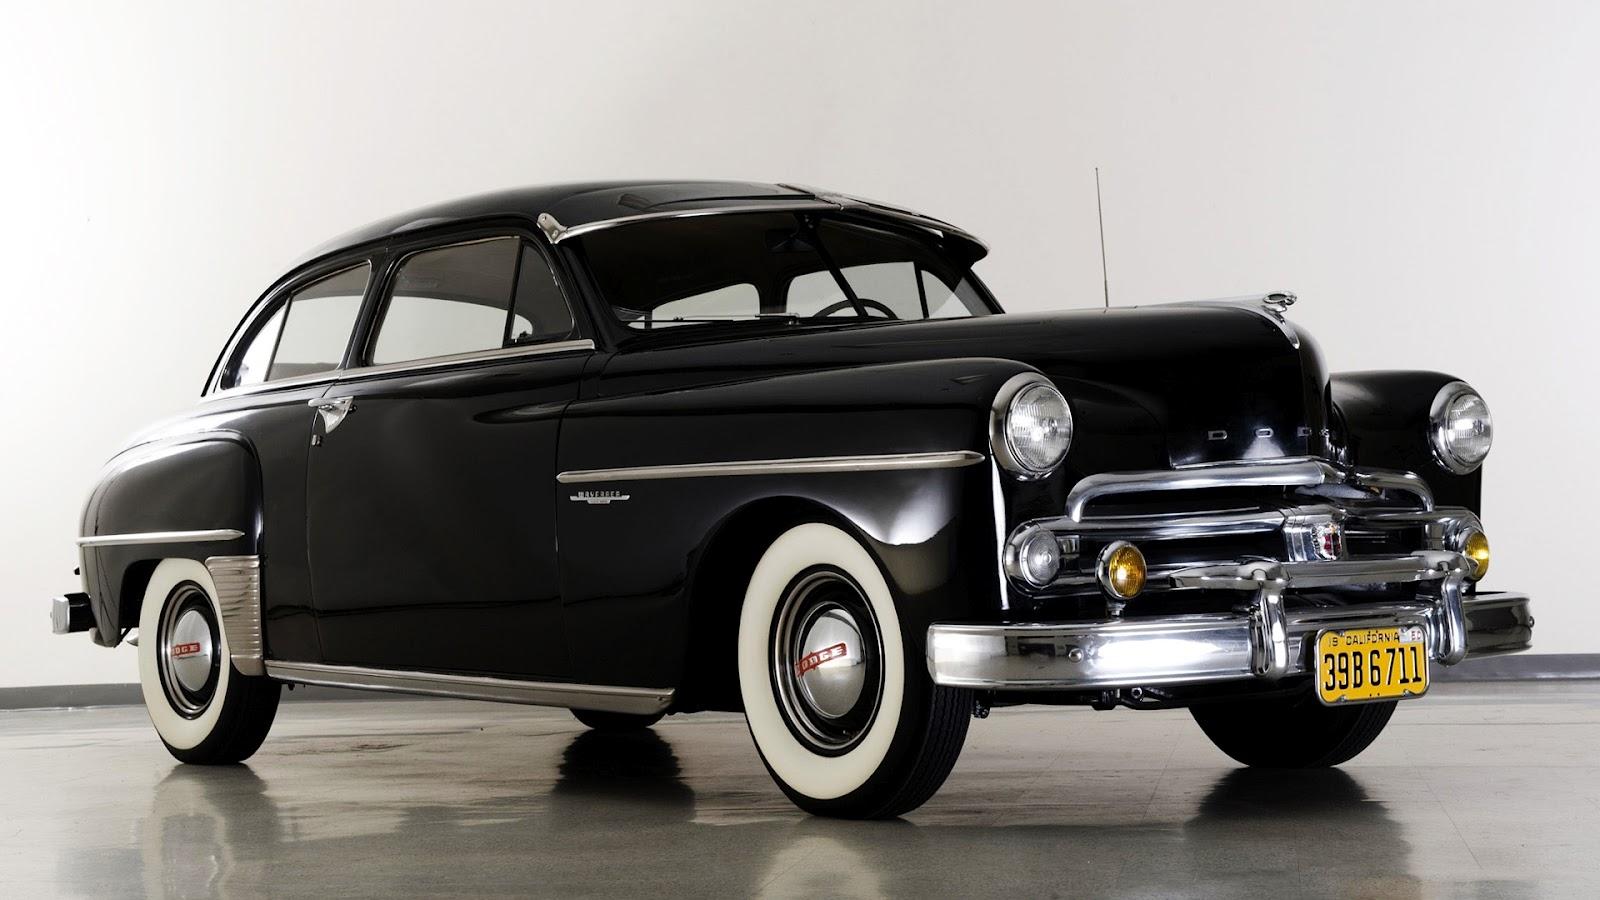 Automotiveblogz: Classic / Old Cars Wallpapers